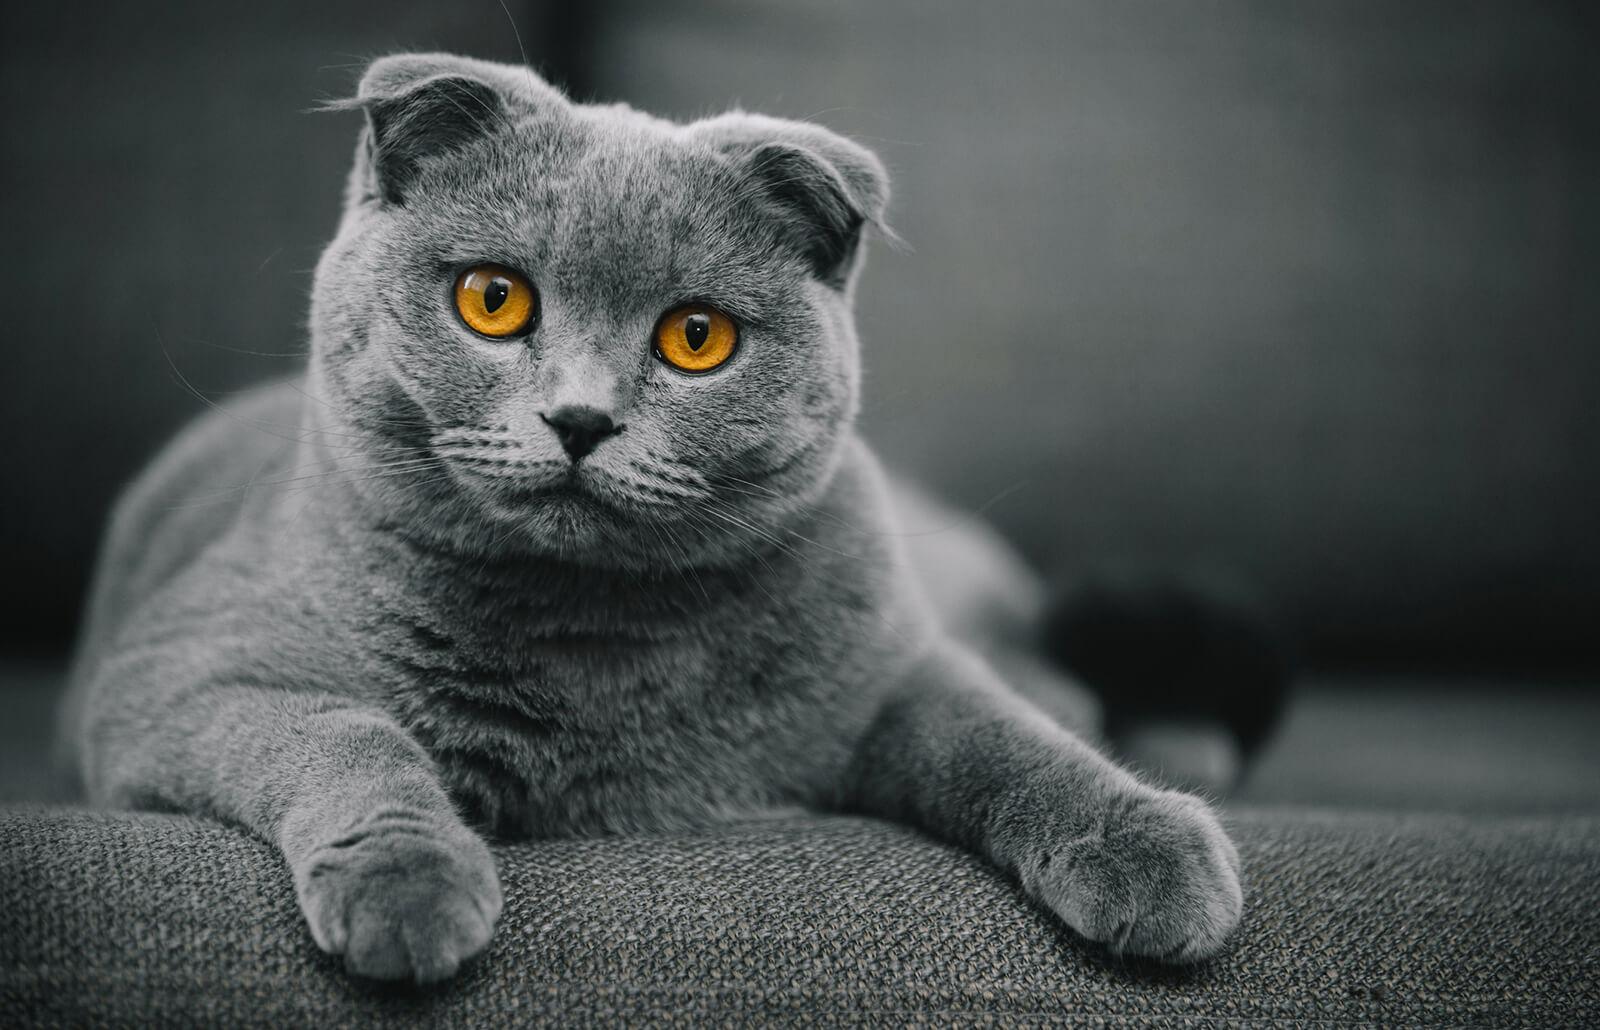 Scottish Fold Cat Breed History and Information | LoveToKnow